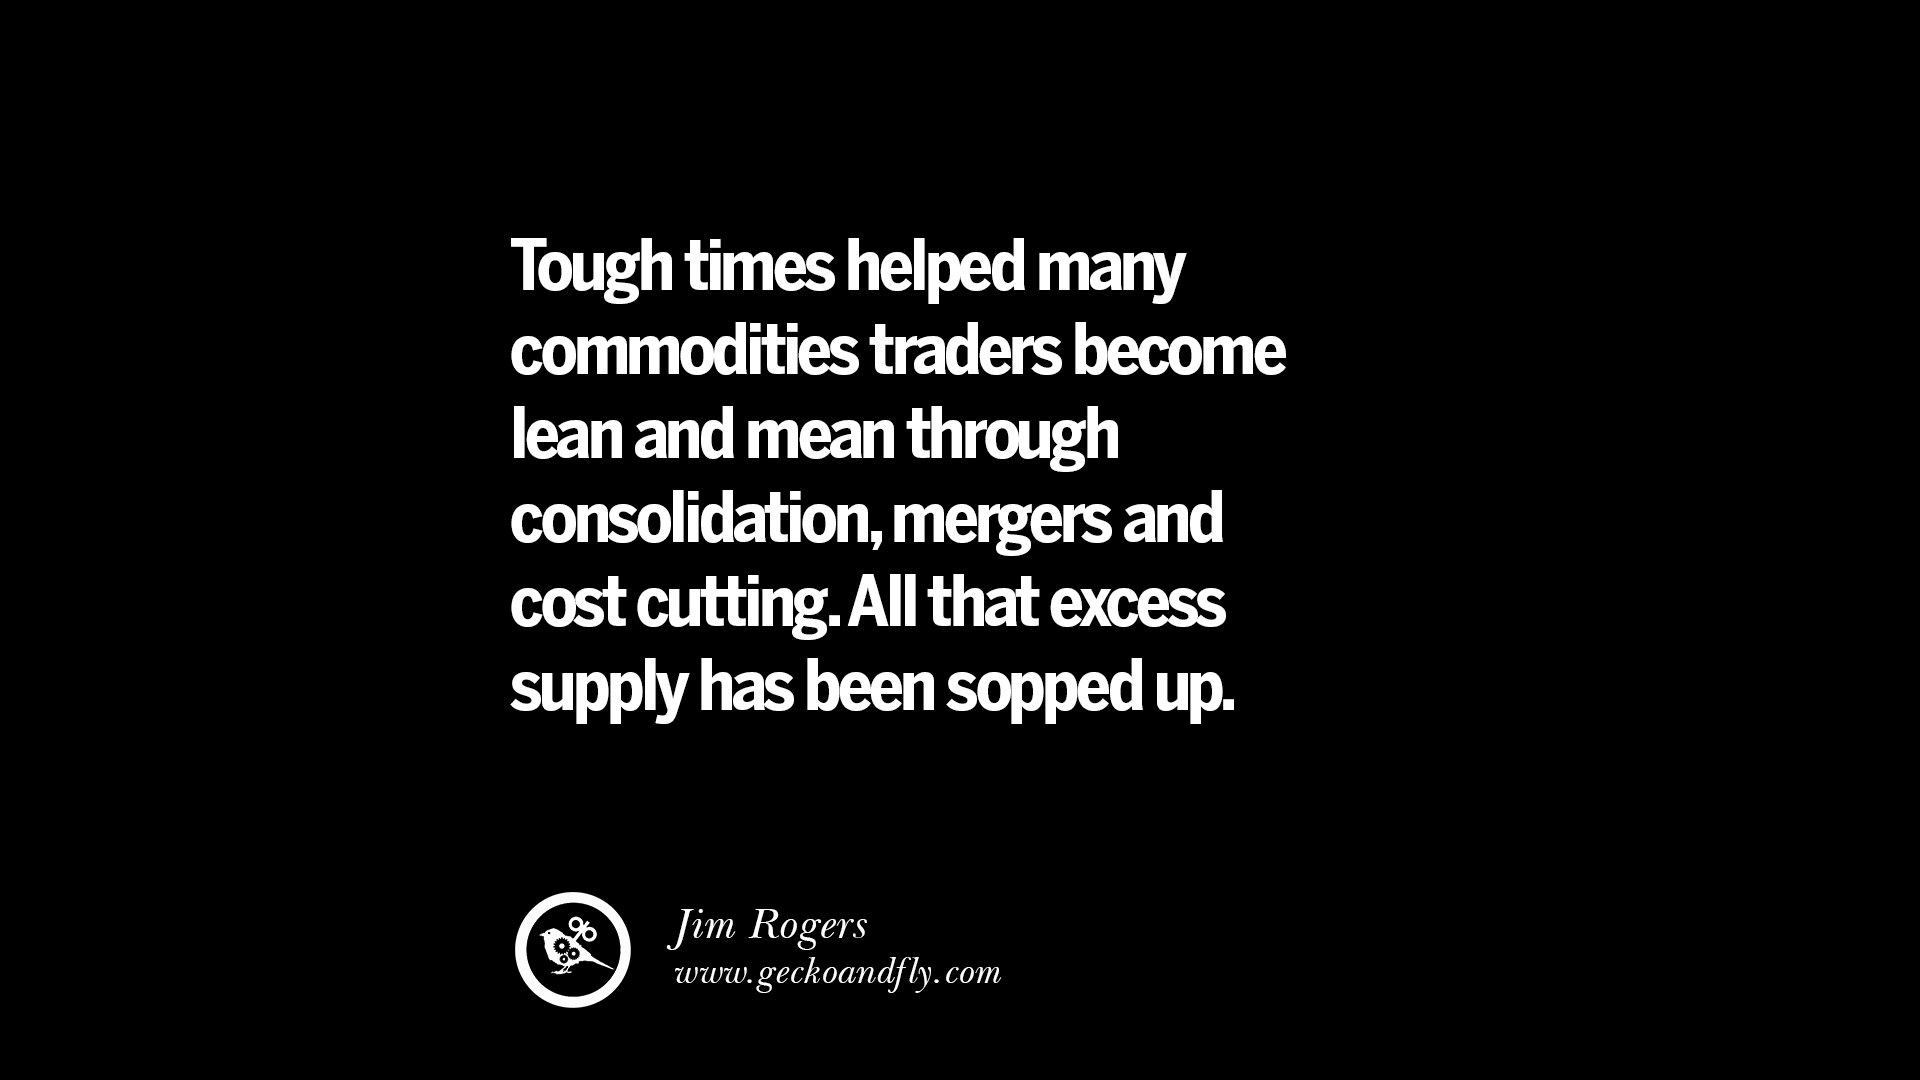 Commodity Quotes Commodities Trading Meaning Dubai  Stock Market Training Qatar